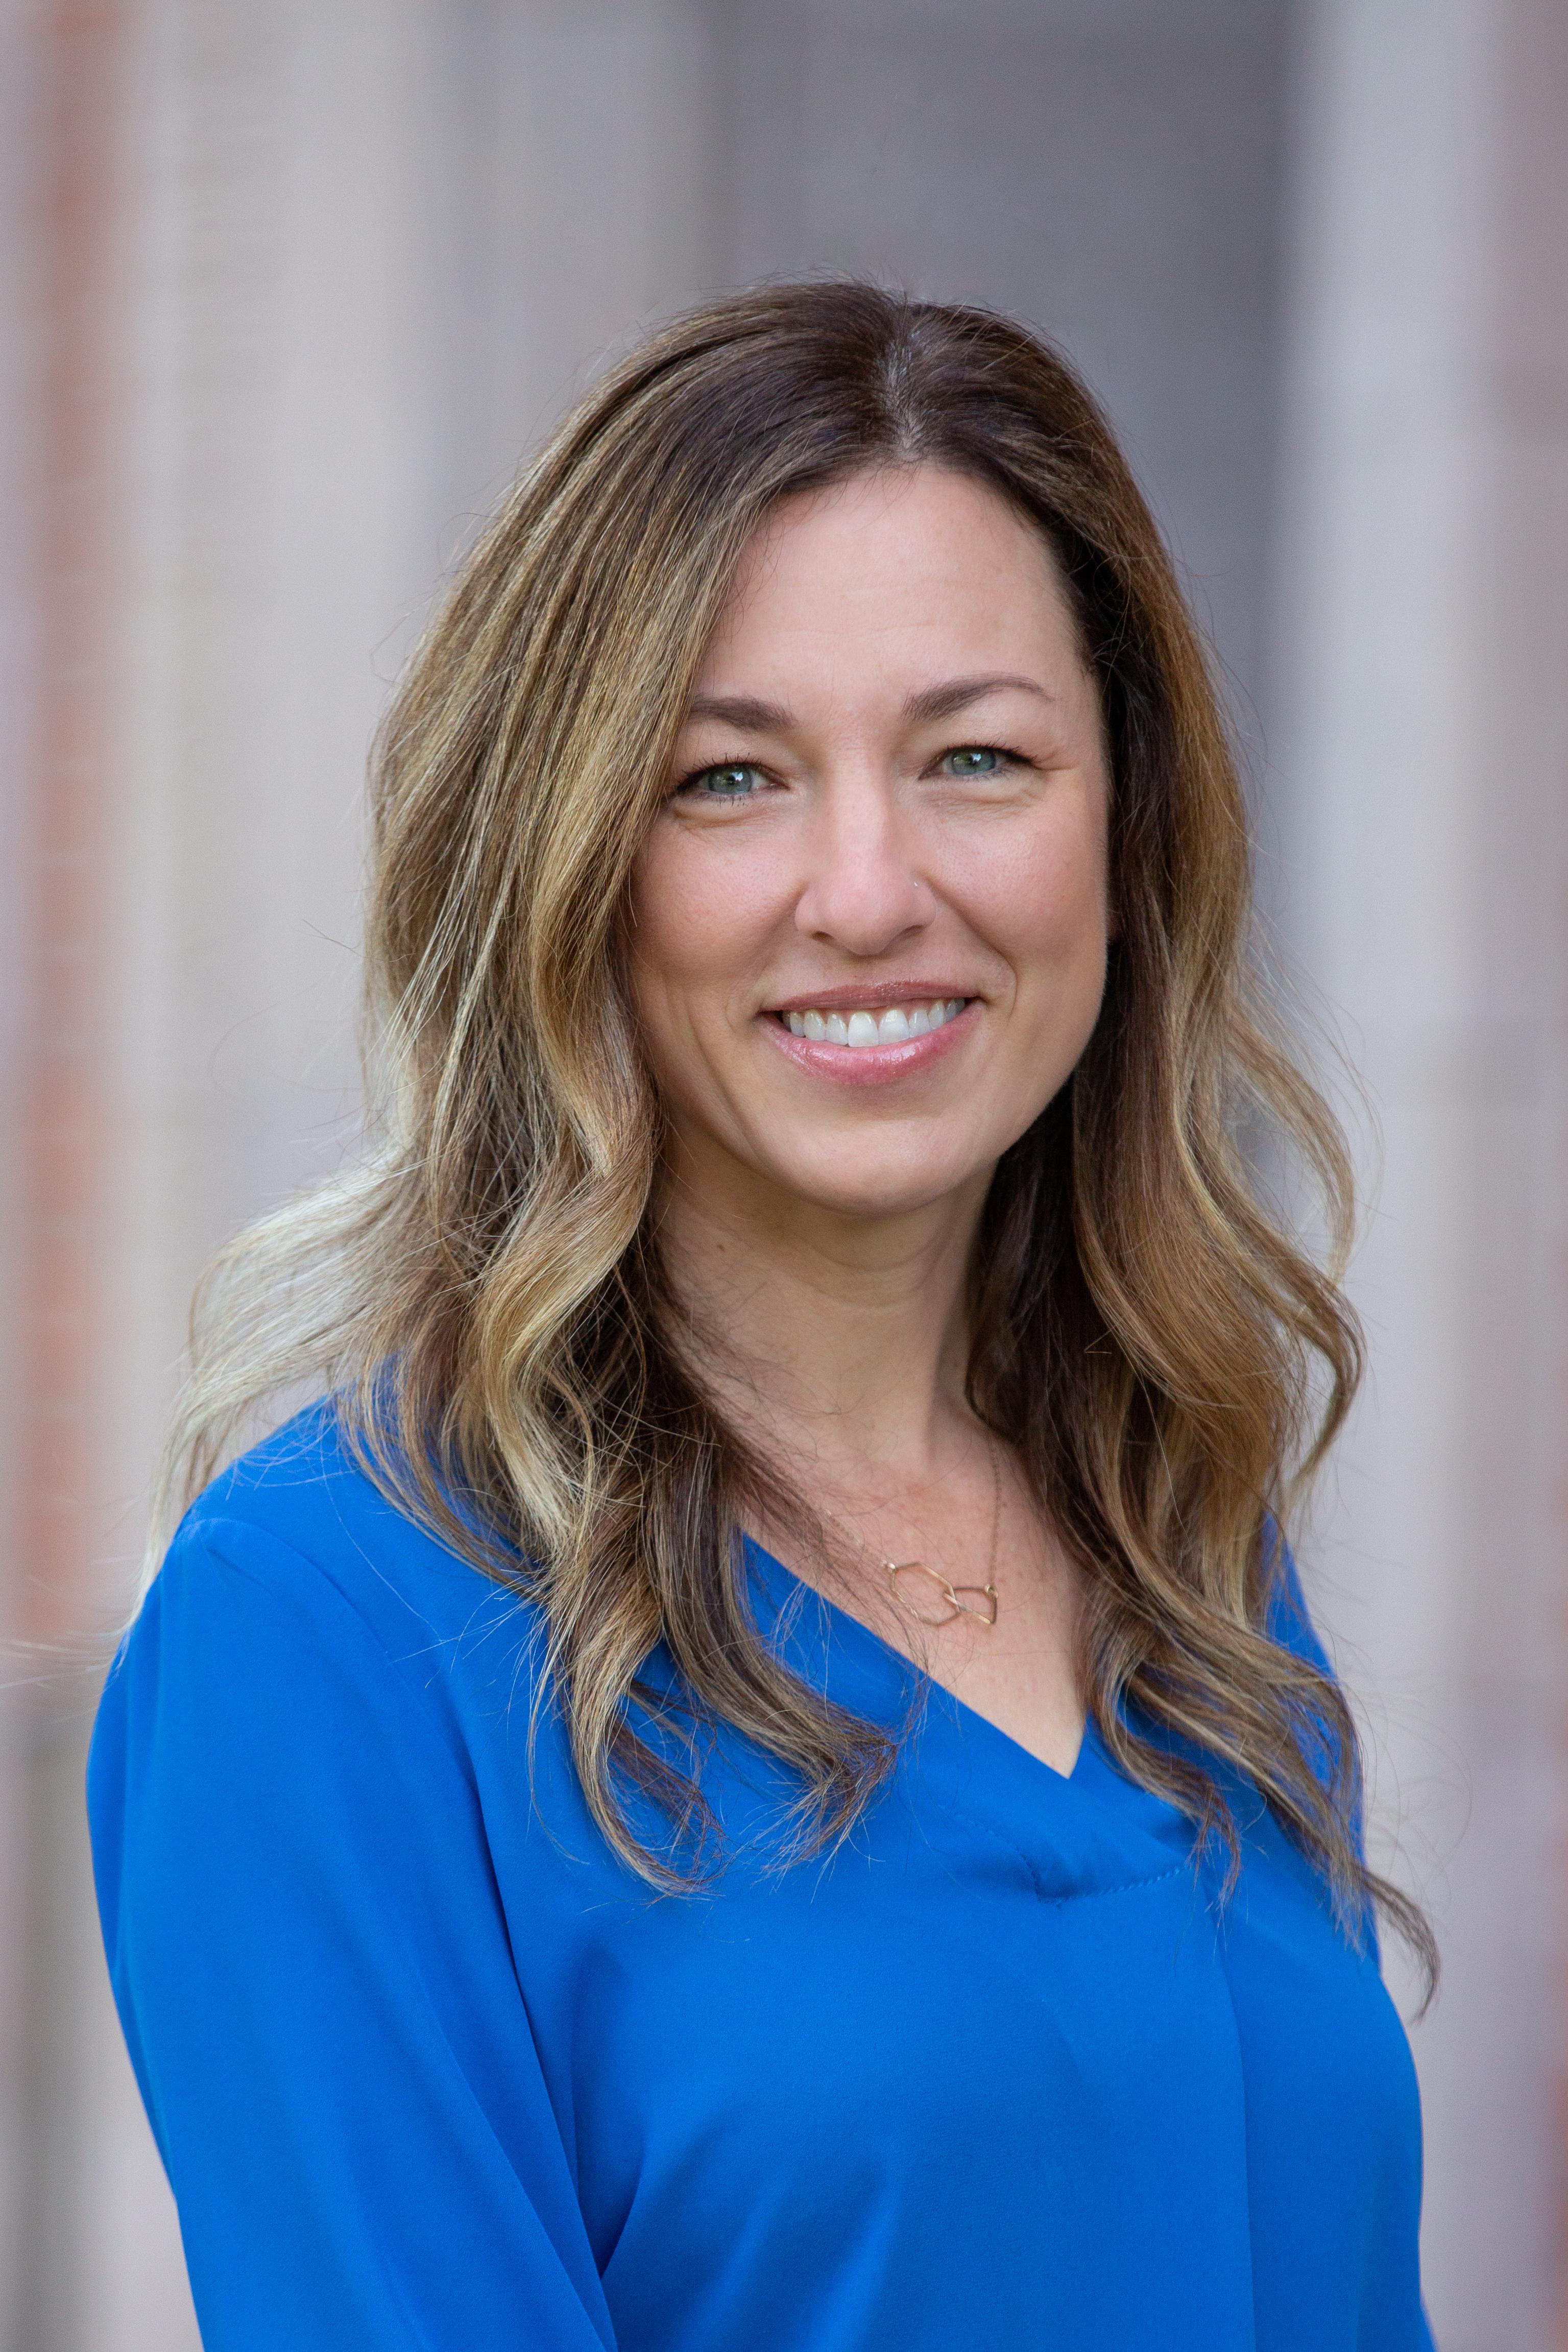 Katie Prentiss